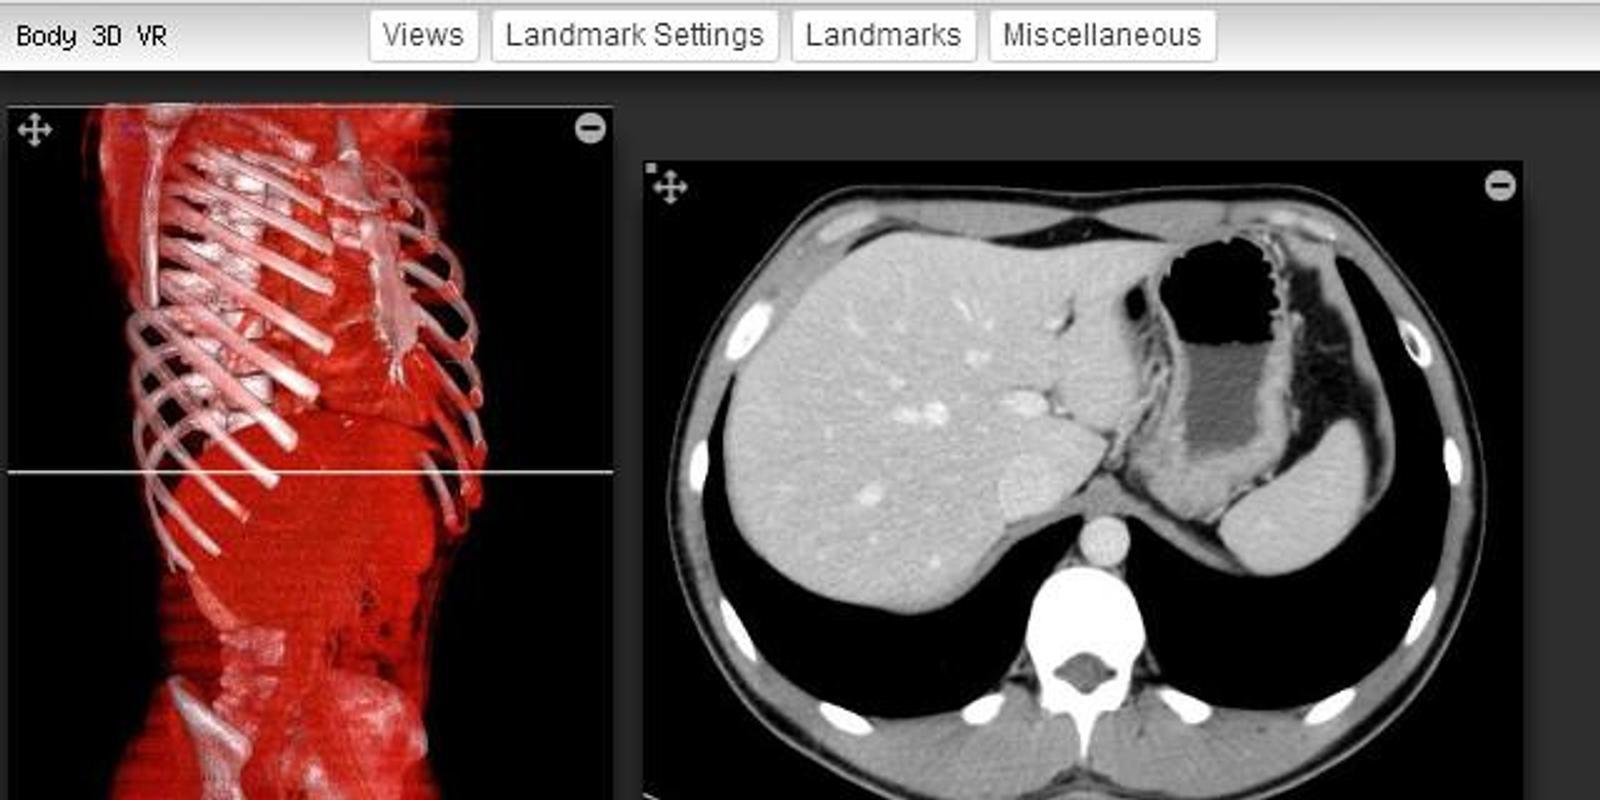 Imaging Anatomy - CT MRI XR US Descarga APK - Gratis Herramientas ...